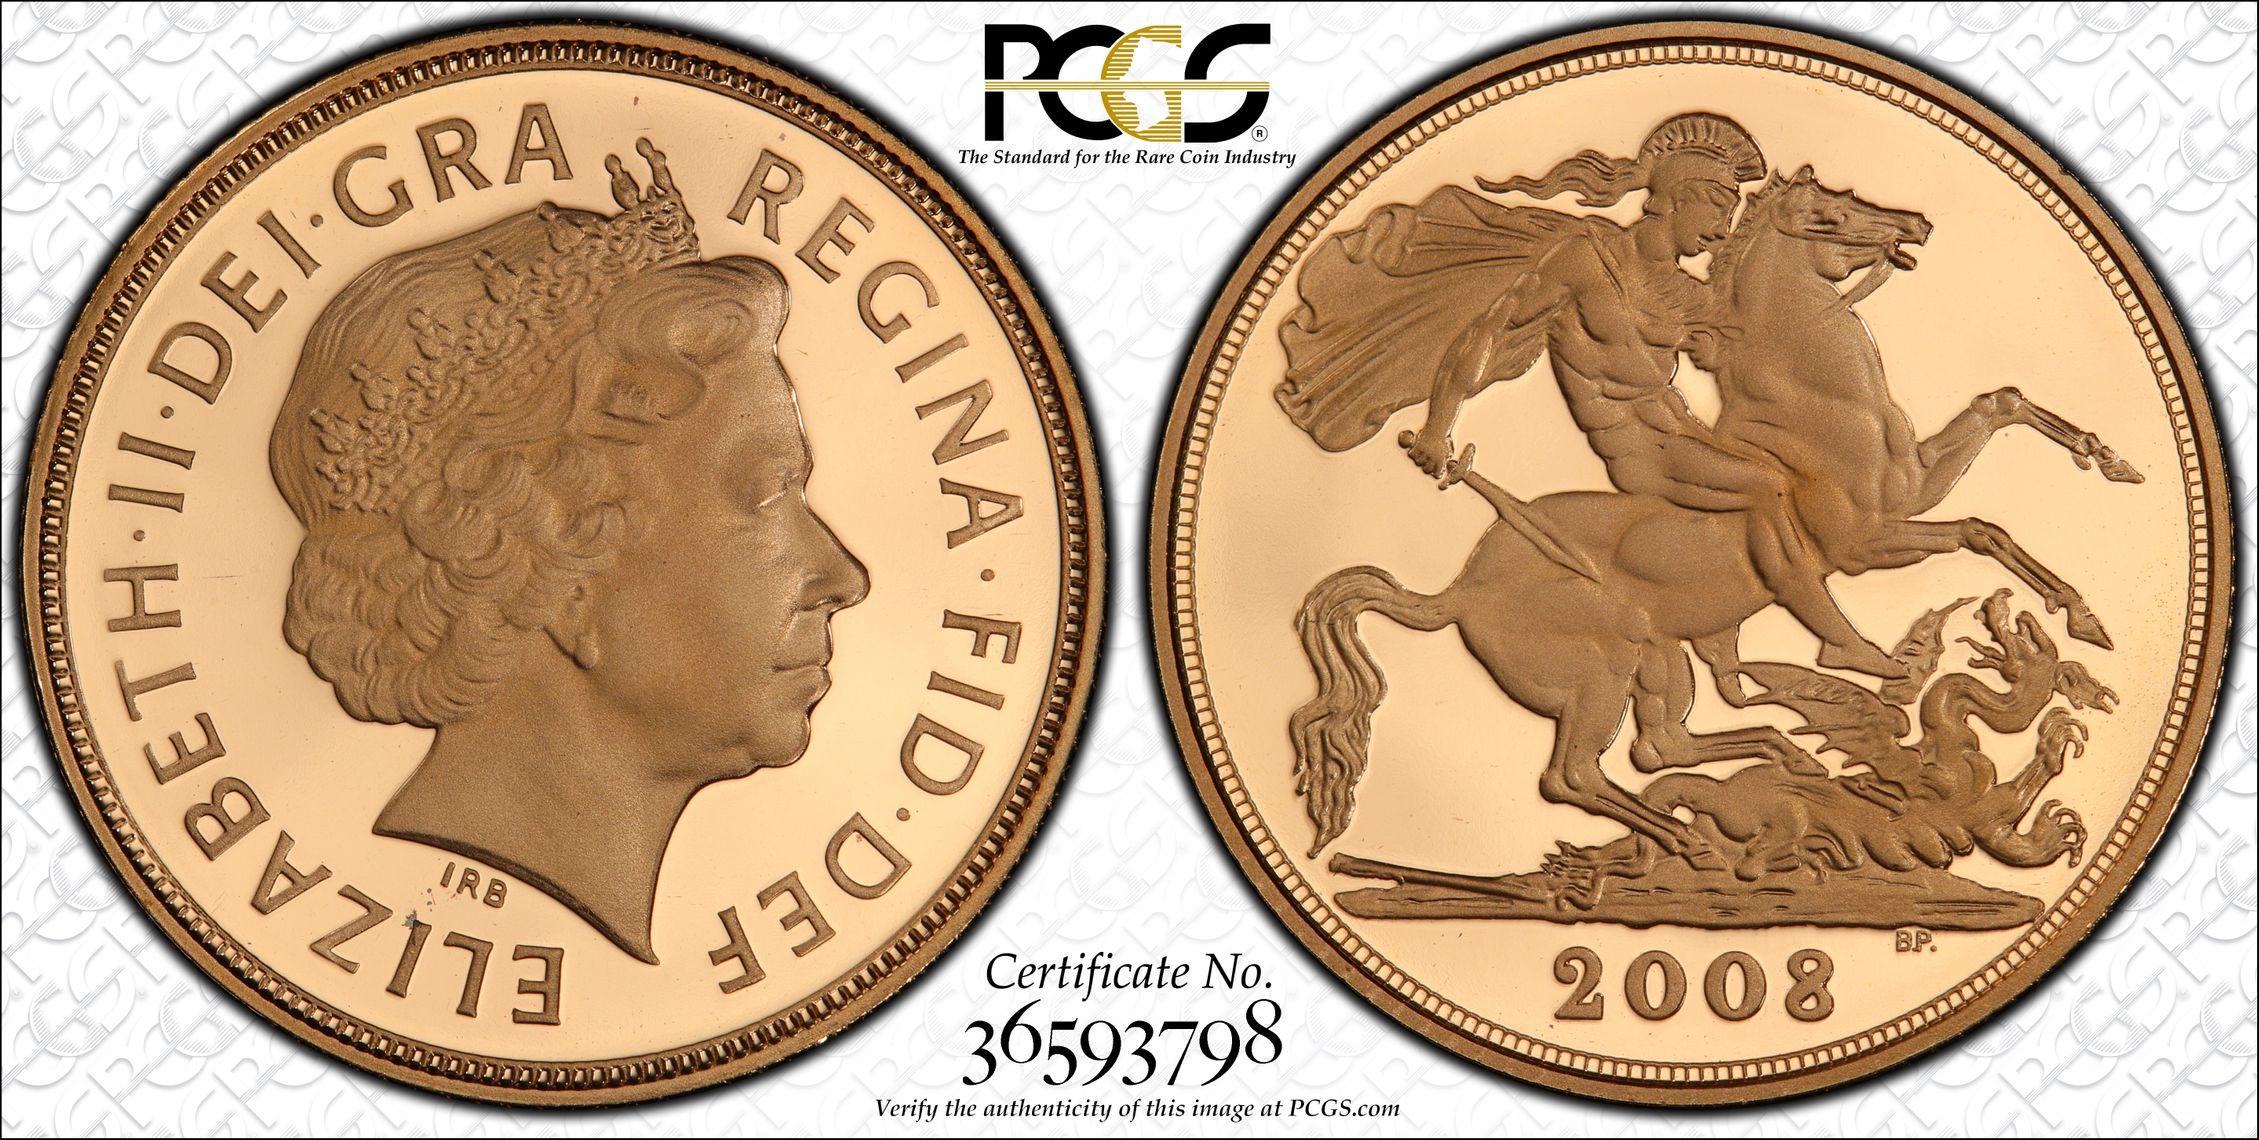 Great Britain 2008 Sovereign - PCGS PR69